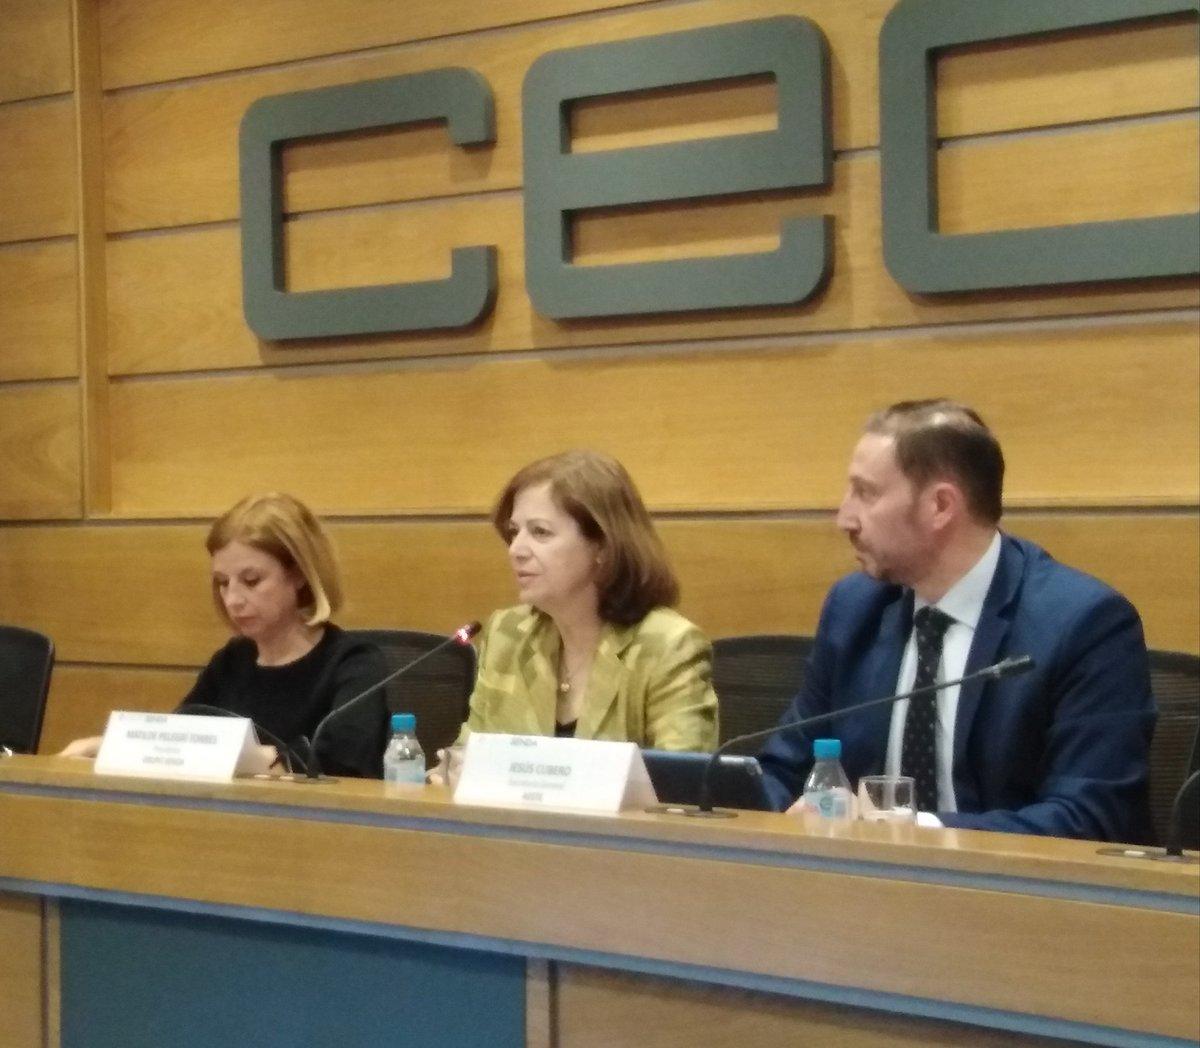 test Twitter Media - .@MatildePelegri #RosaSantos de @CEOE_ES y @JCuberoHerr inauguran la jornada #AutoprotecciónSENDA @LegalPlanning_ https://t.co/AKOKcAtR5x